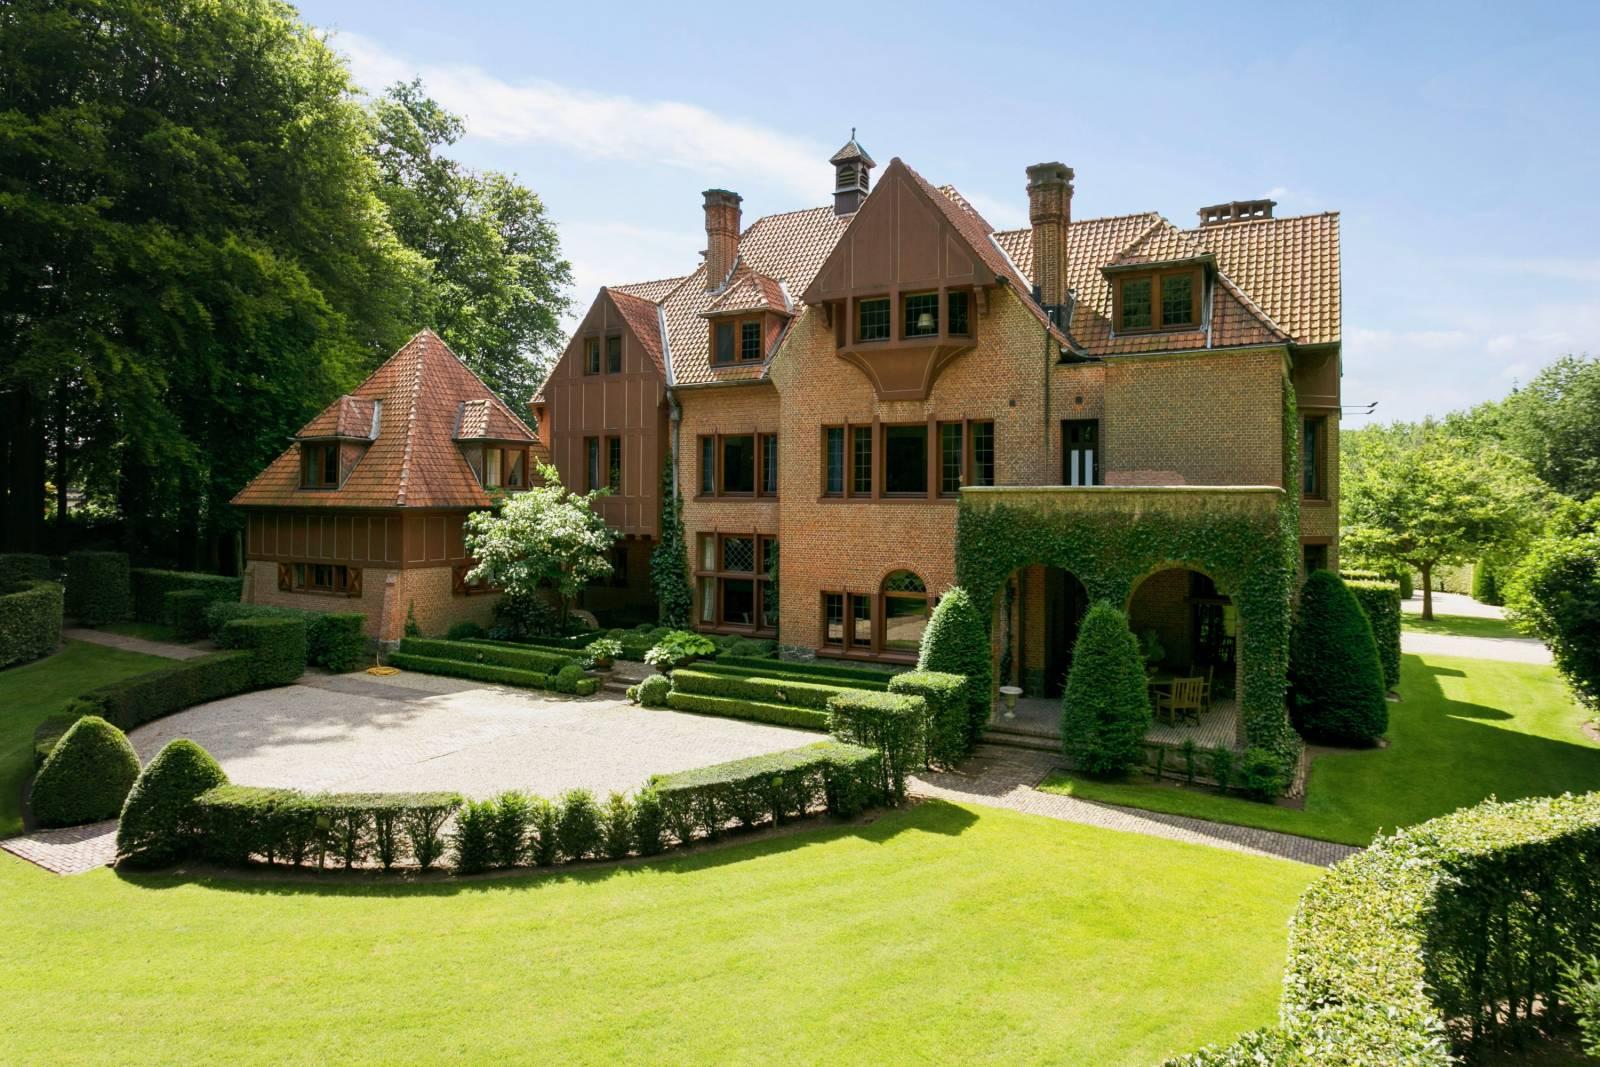 Louise Marie Manor Gardens - Feestzaal - House Of Weddings - 31